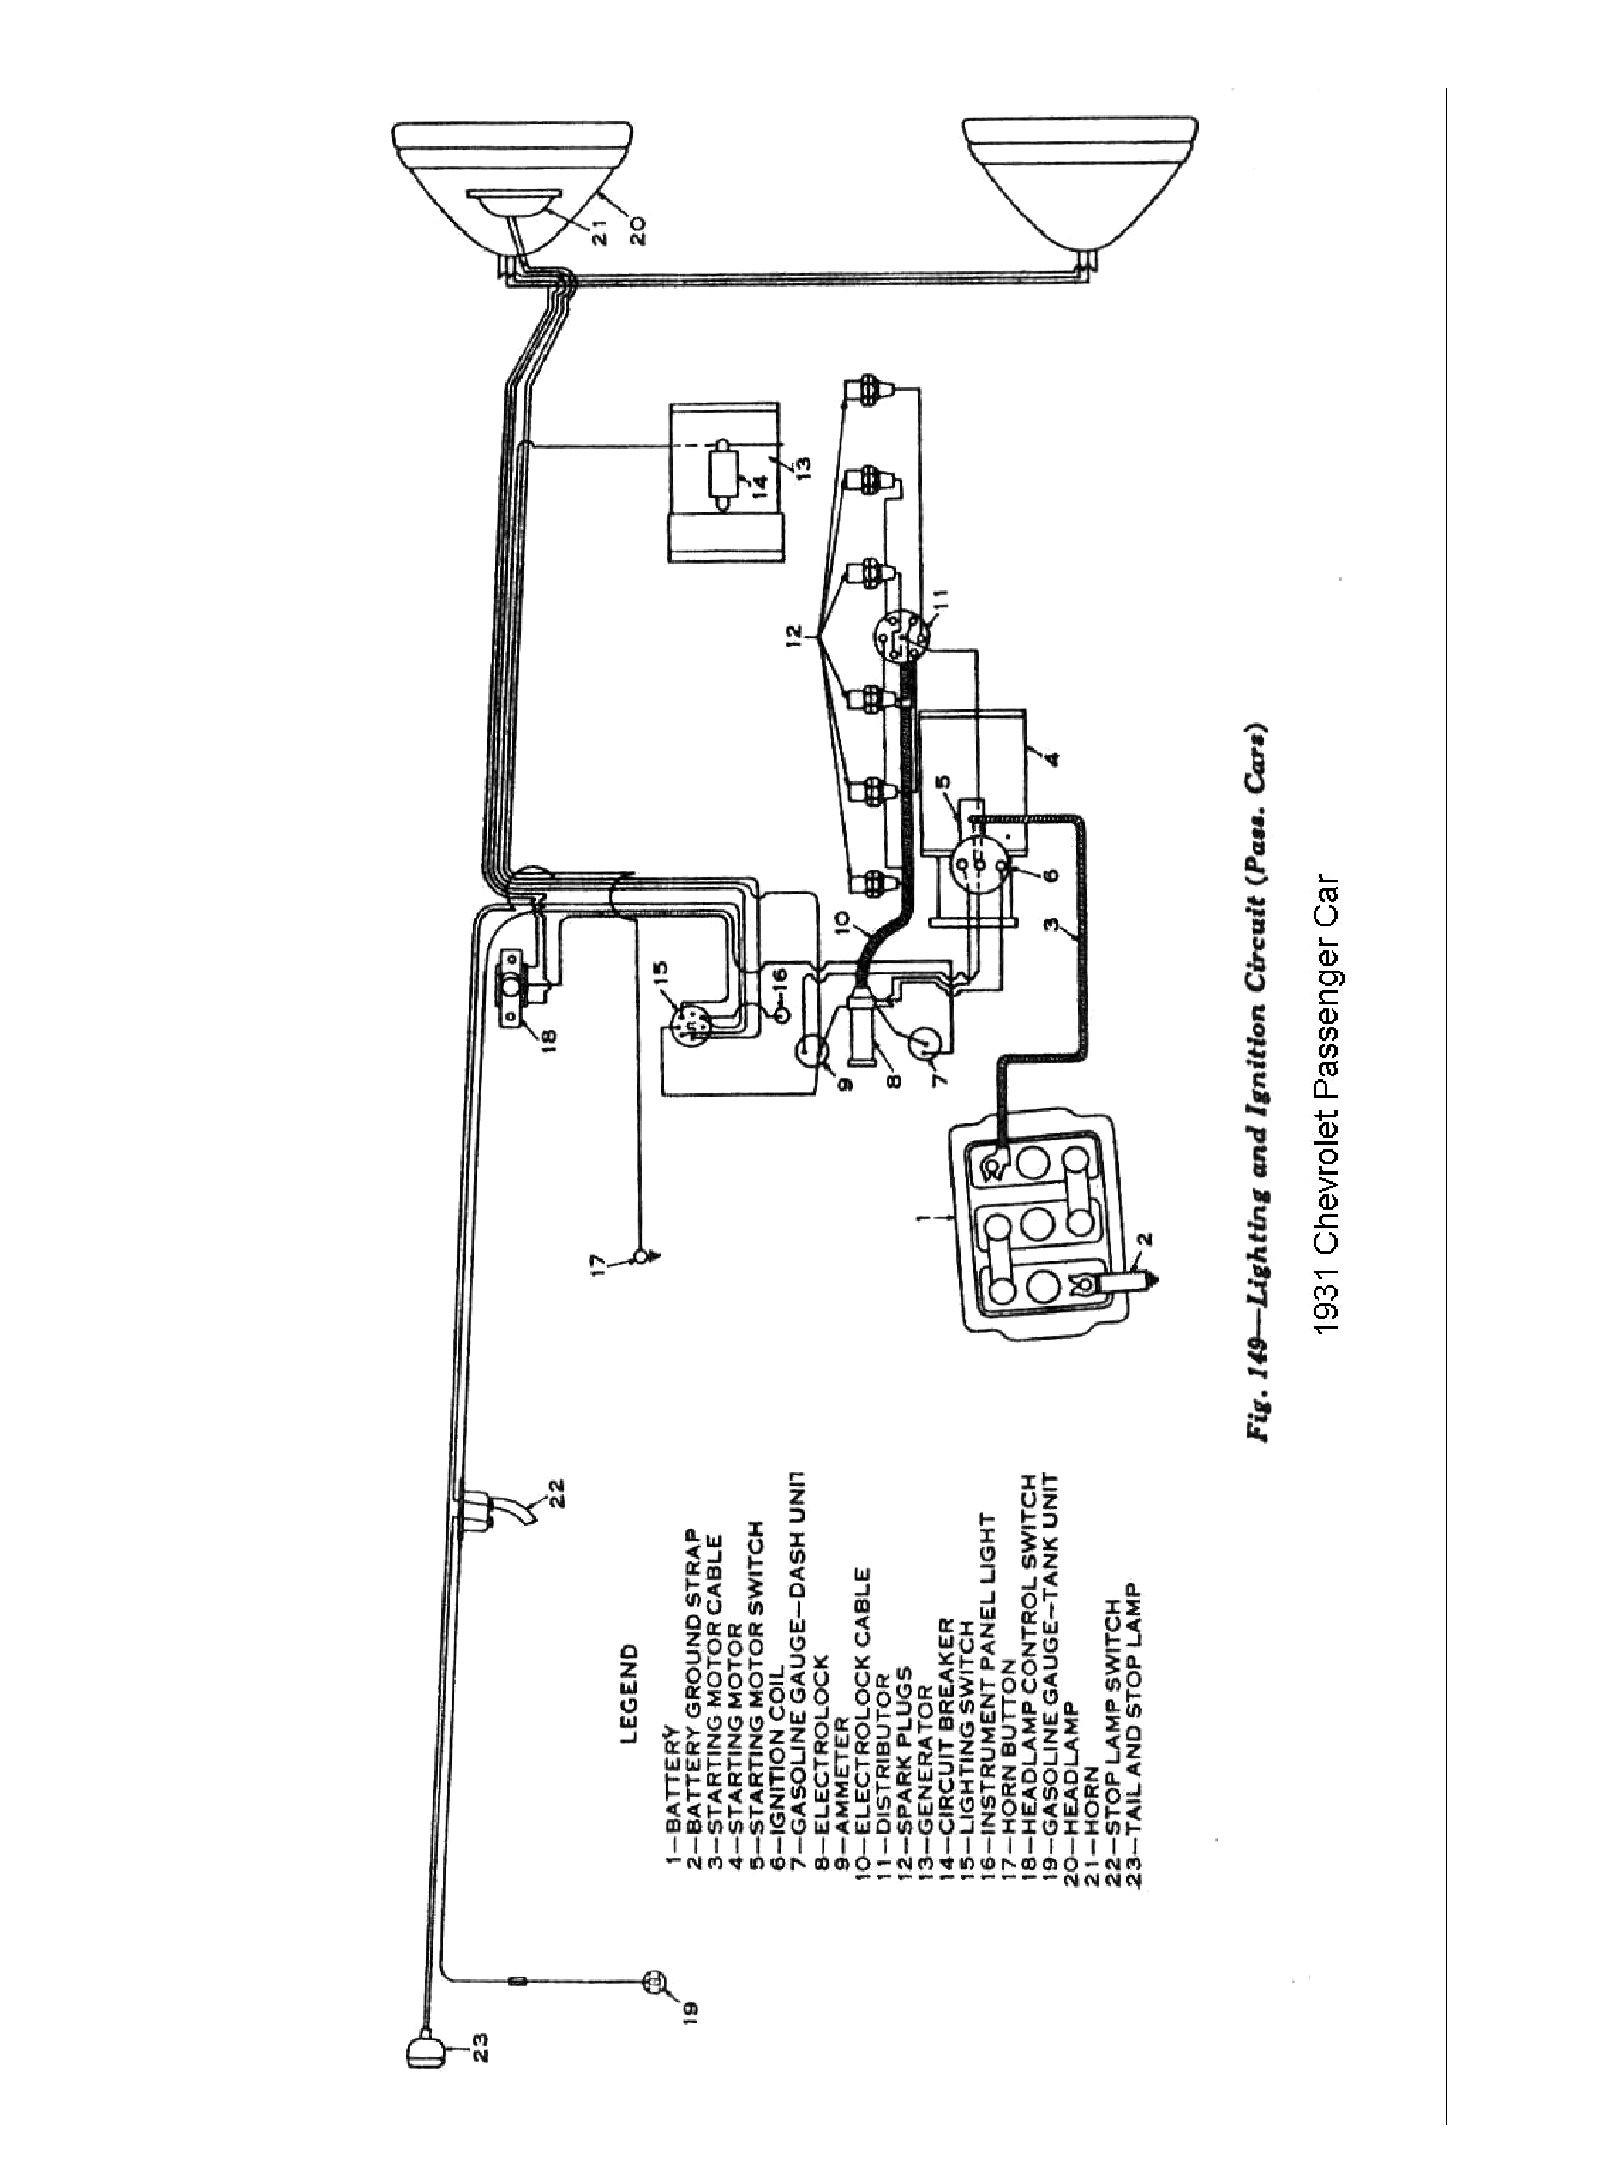 2011 silverado horn wiring diagram complete wiring diagrams \u2022 2006 chevy silverado wiring diagram 2011 silverado tail light wiring diagram chevy wiring diagrams my rh detoxicrecenze com 95 chevy silverado wiring diagram 03 silverado stereo wiring diagram